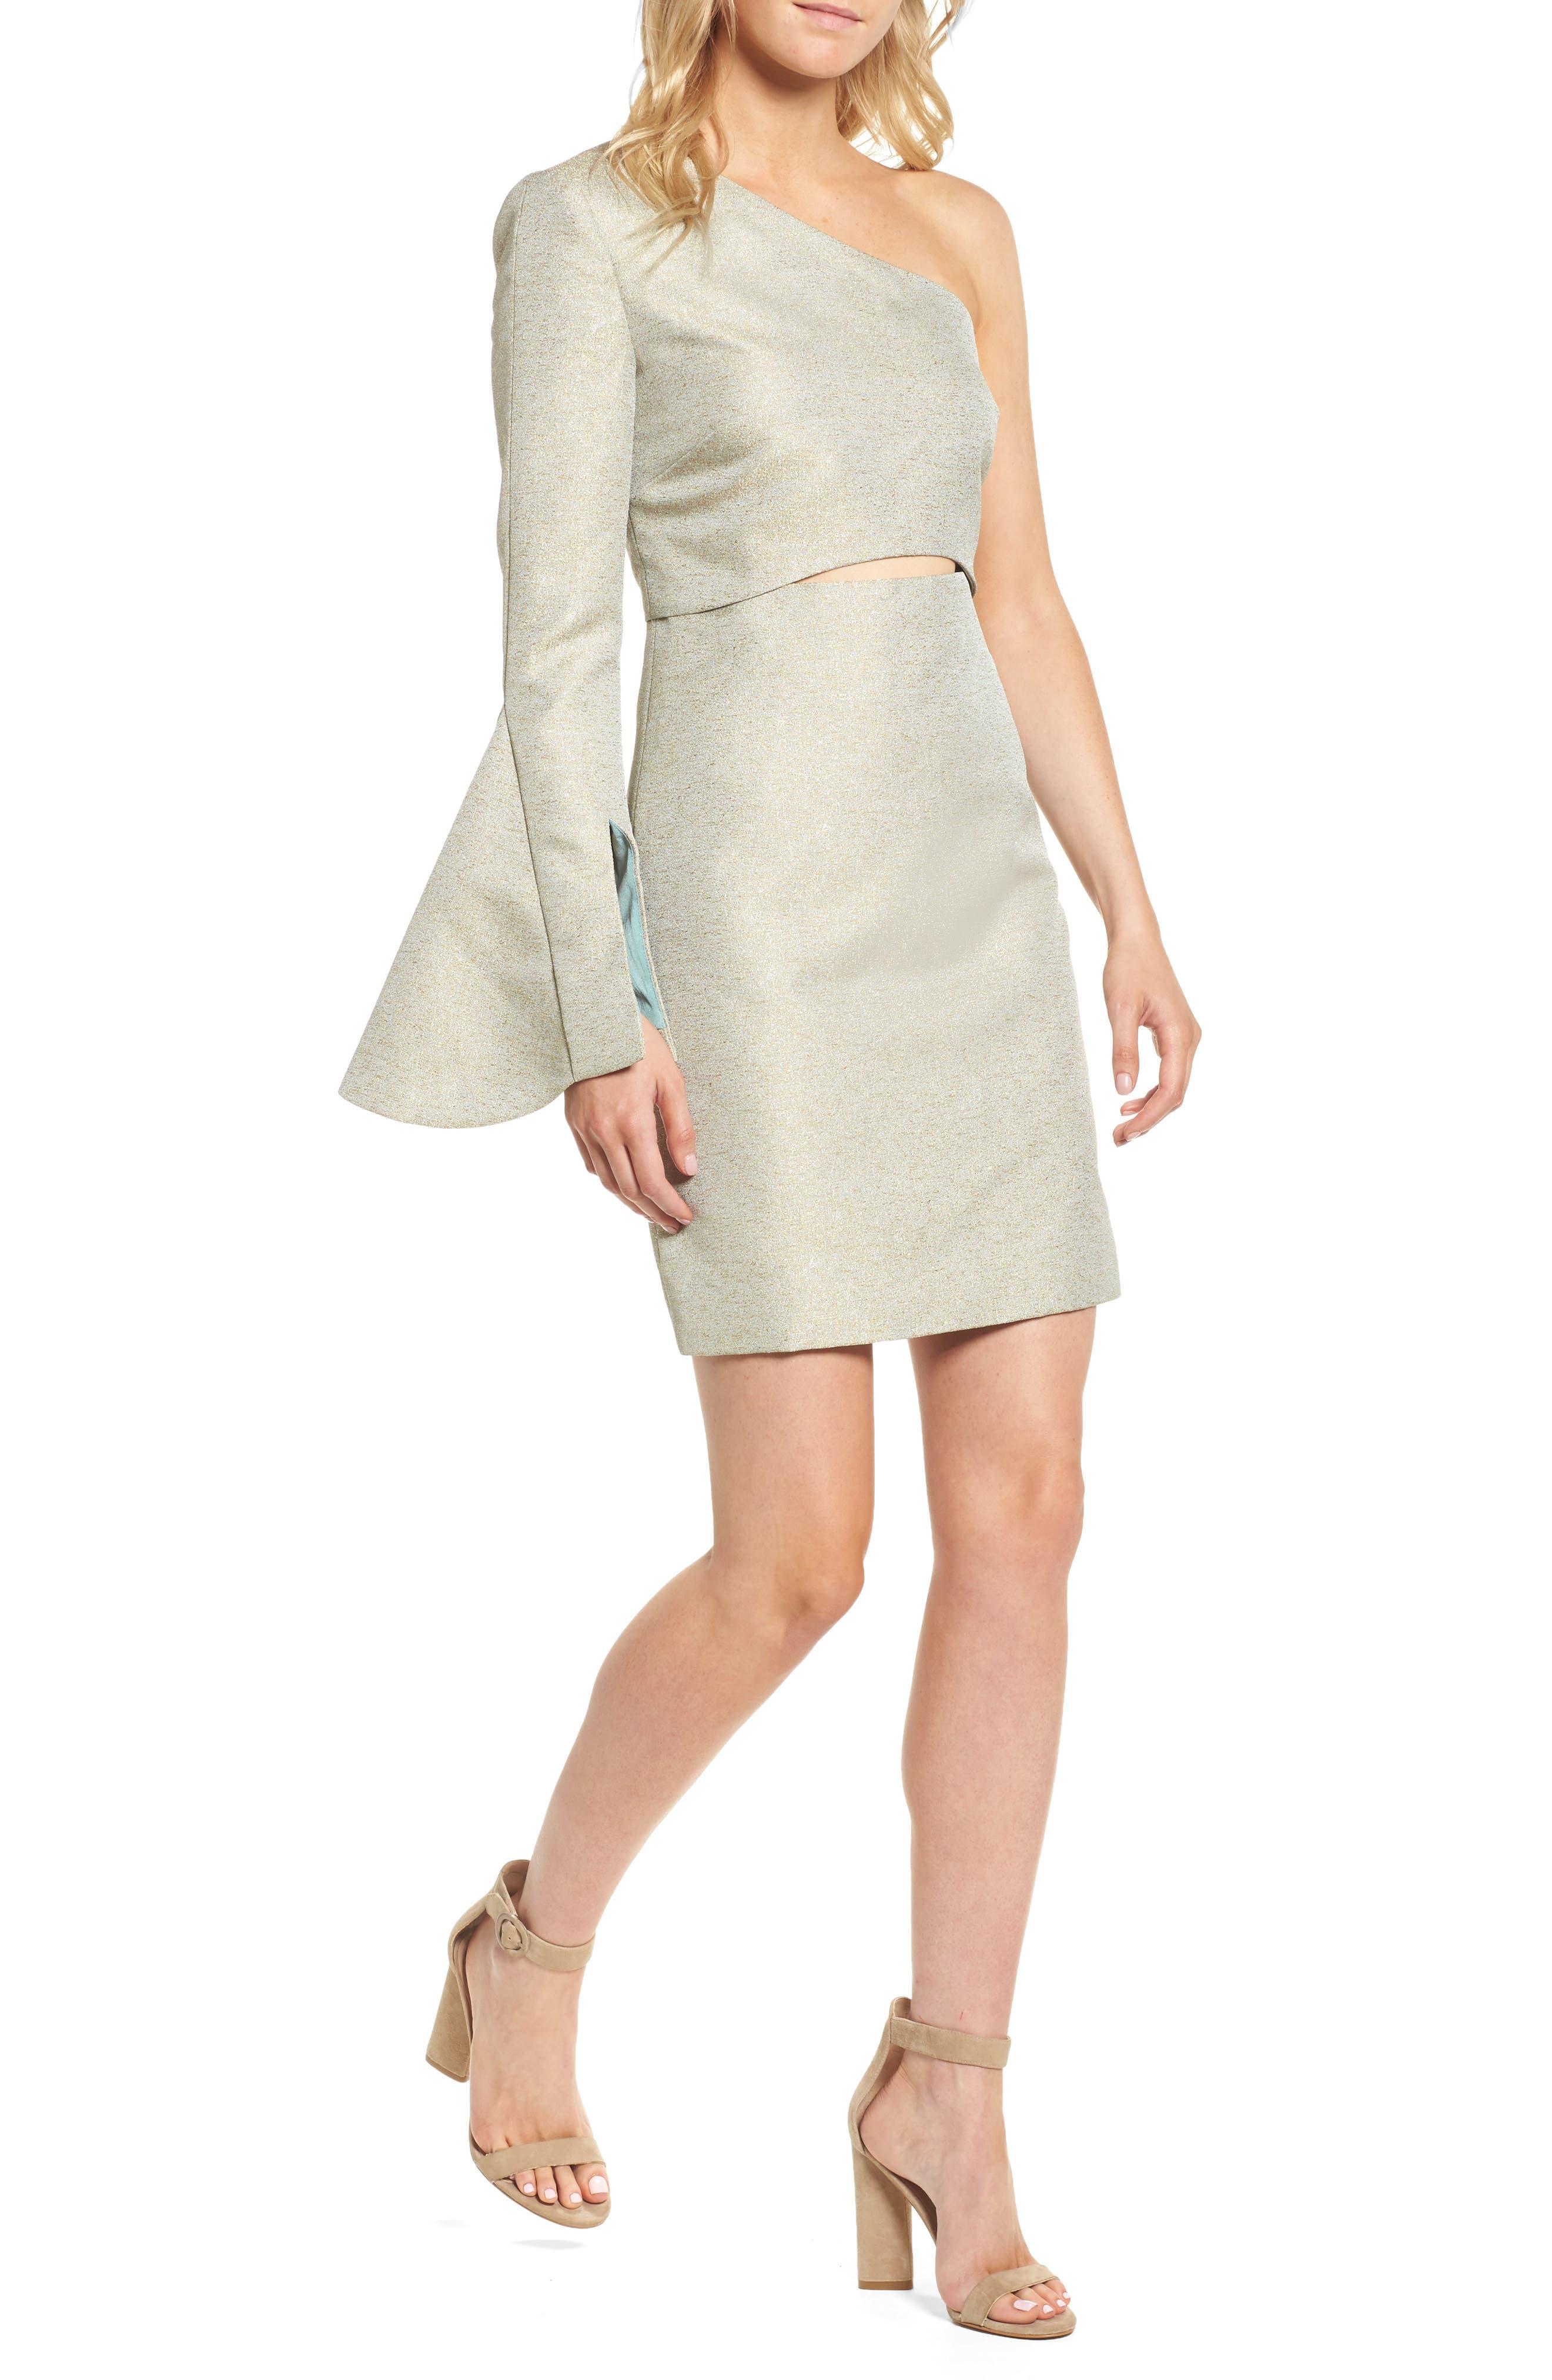 Valencia One-Shoulder Minidress,                             Main thumbnail 1, color,                             376